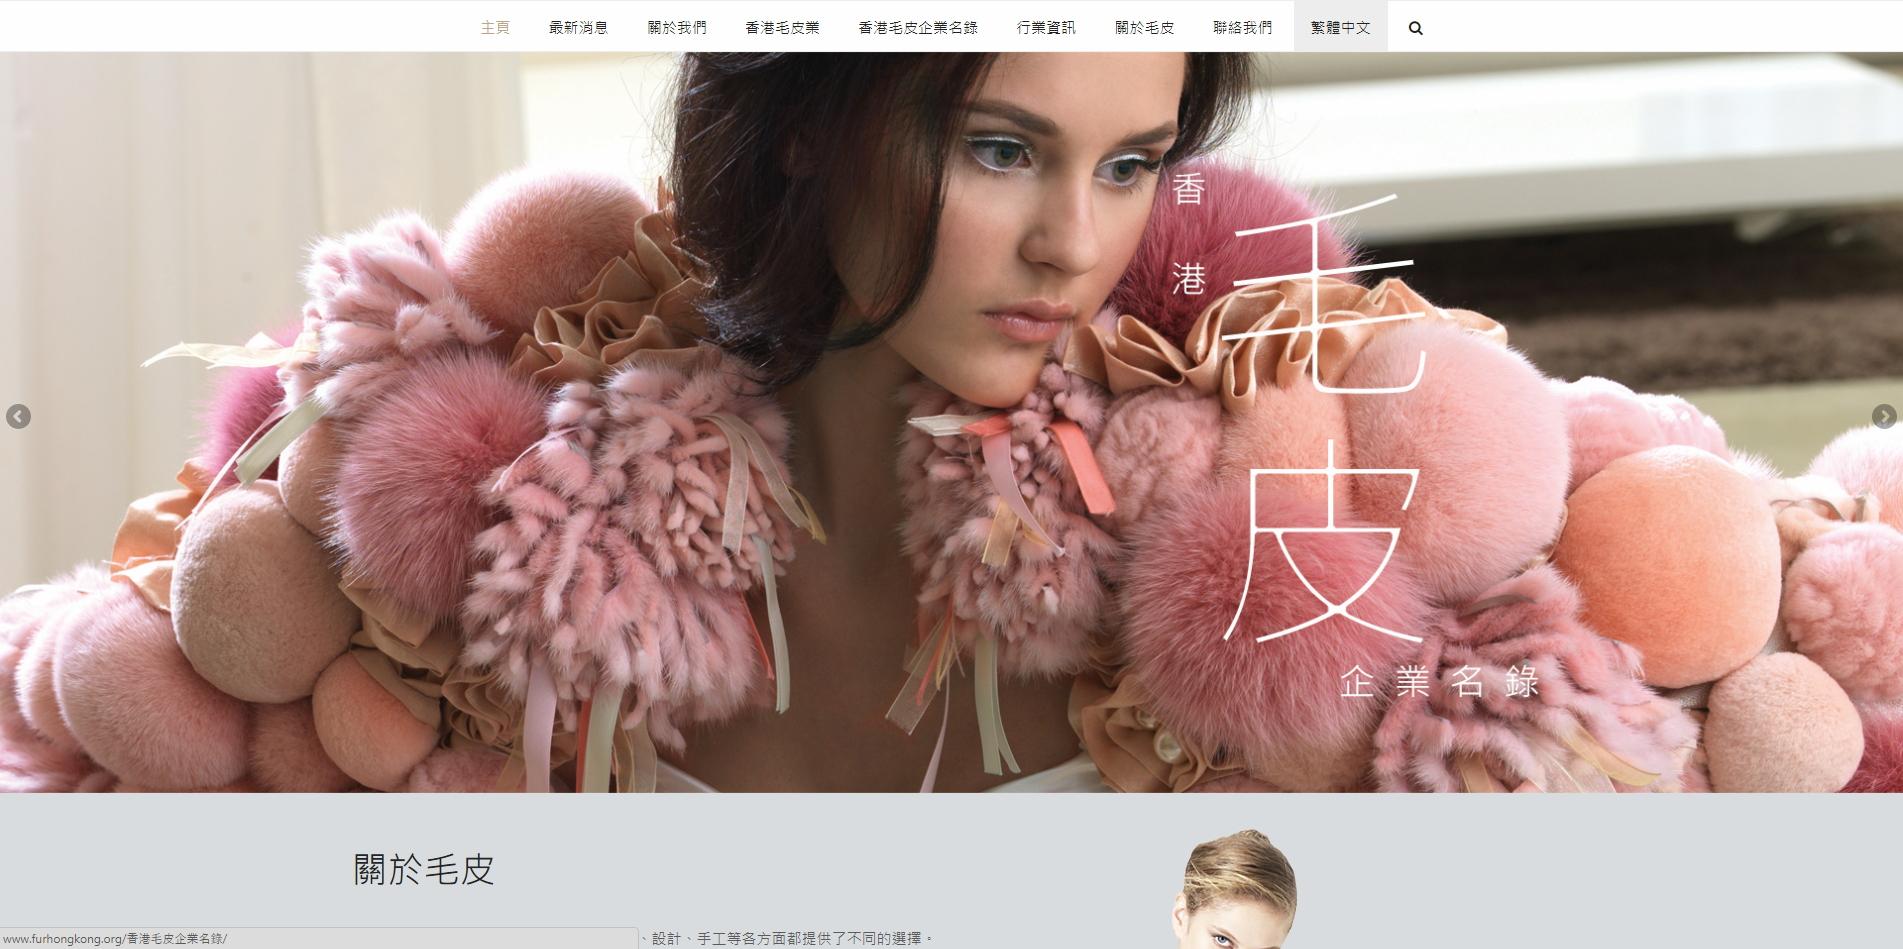 Fur Hong Kong Industry